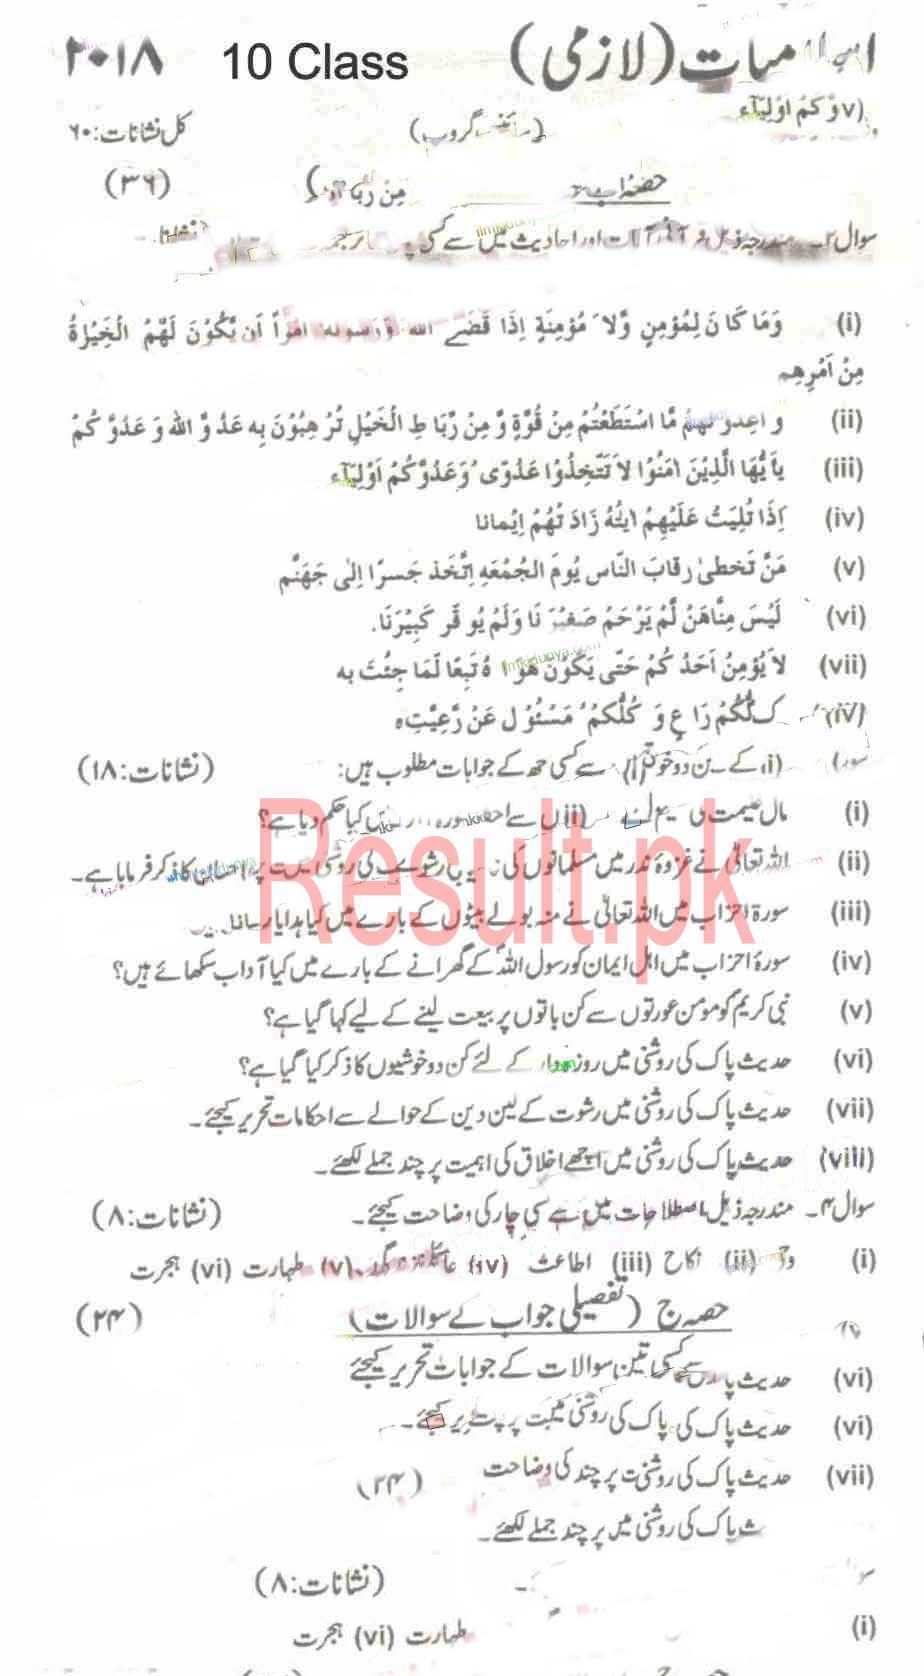 BSEK Karachi Board Past Papers 2019 Matric, SSC Part 1 & 2, 9th